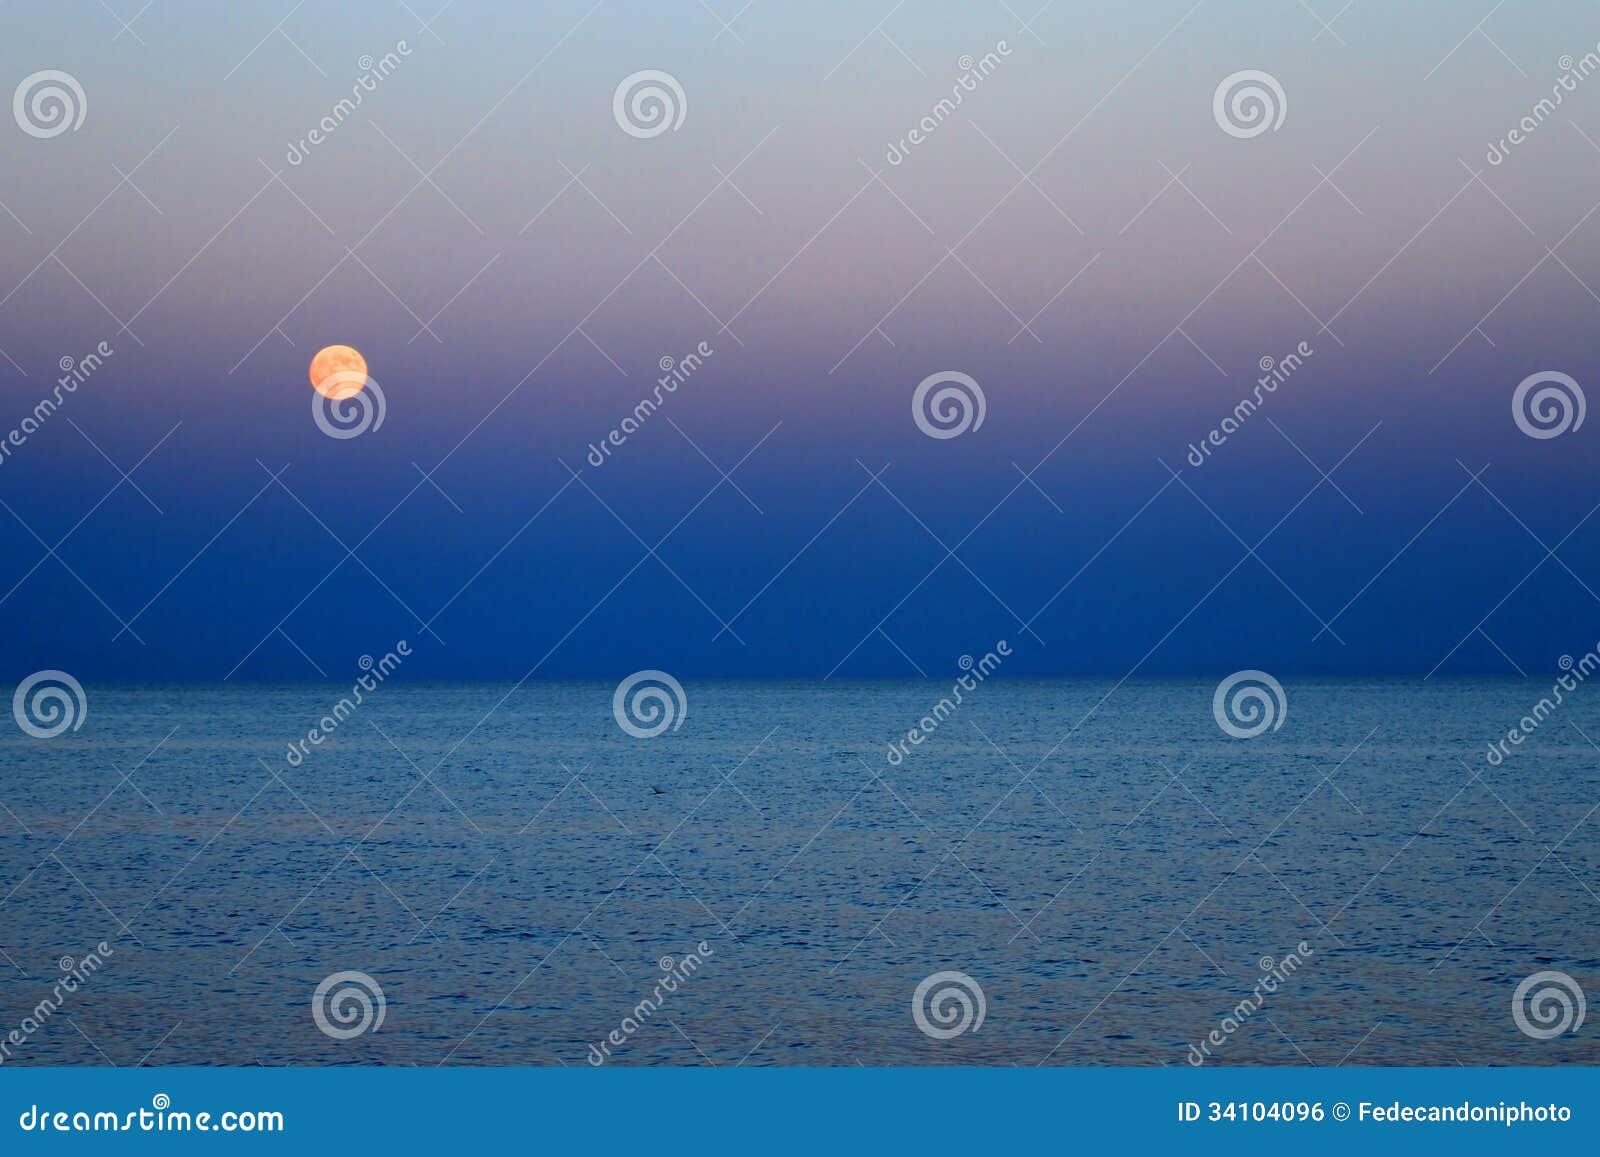 red moon blue sea - photo #25